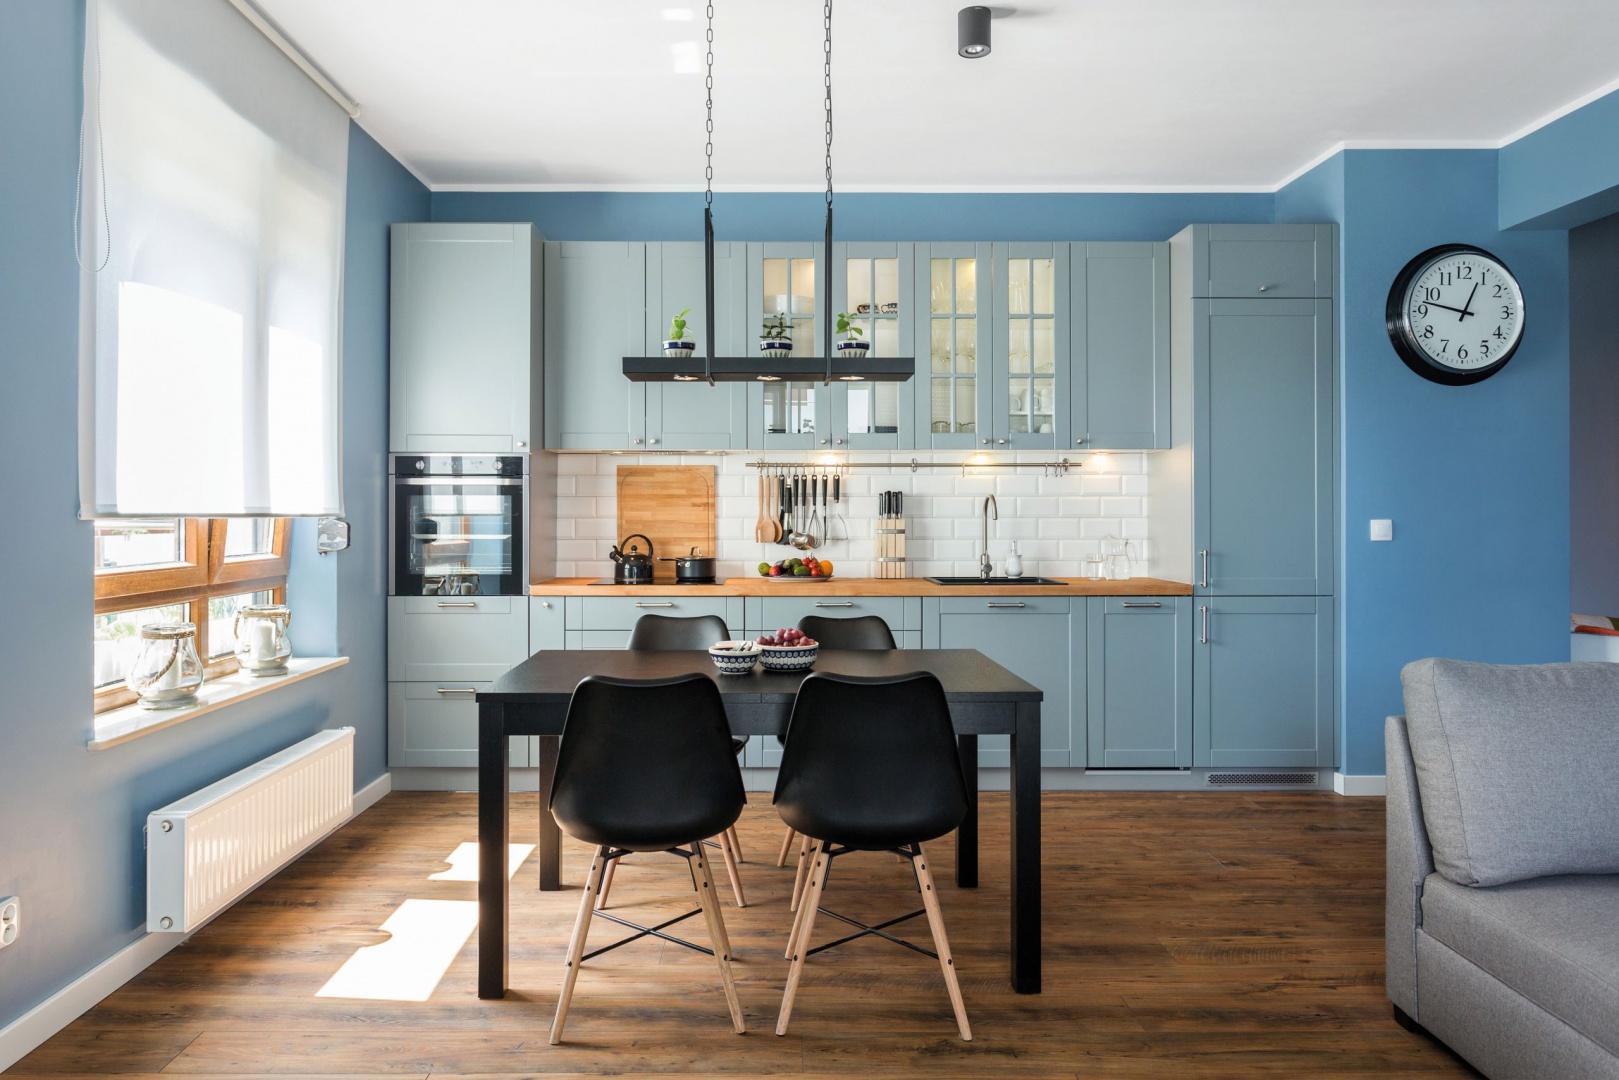 Kuchnia w stylu retro. Fot. Studio Zoya/Max Kuchnie